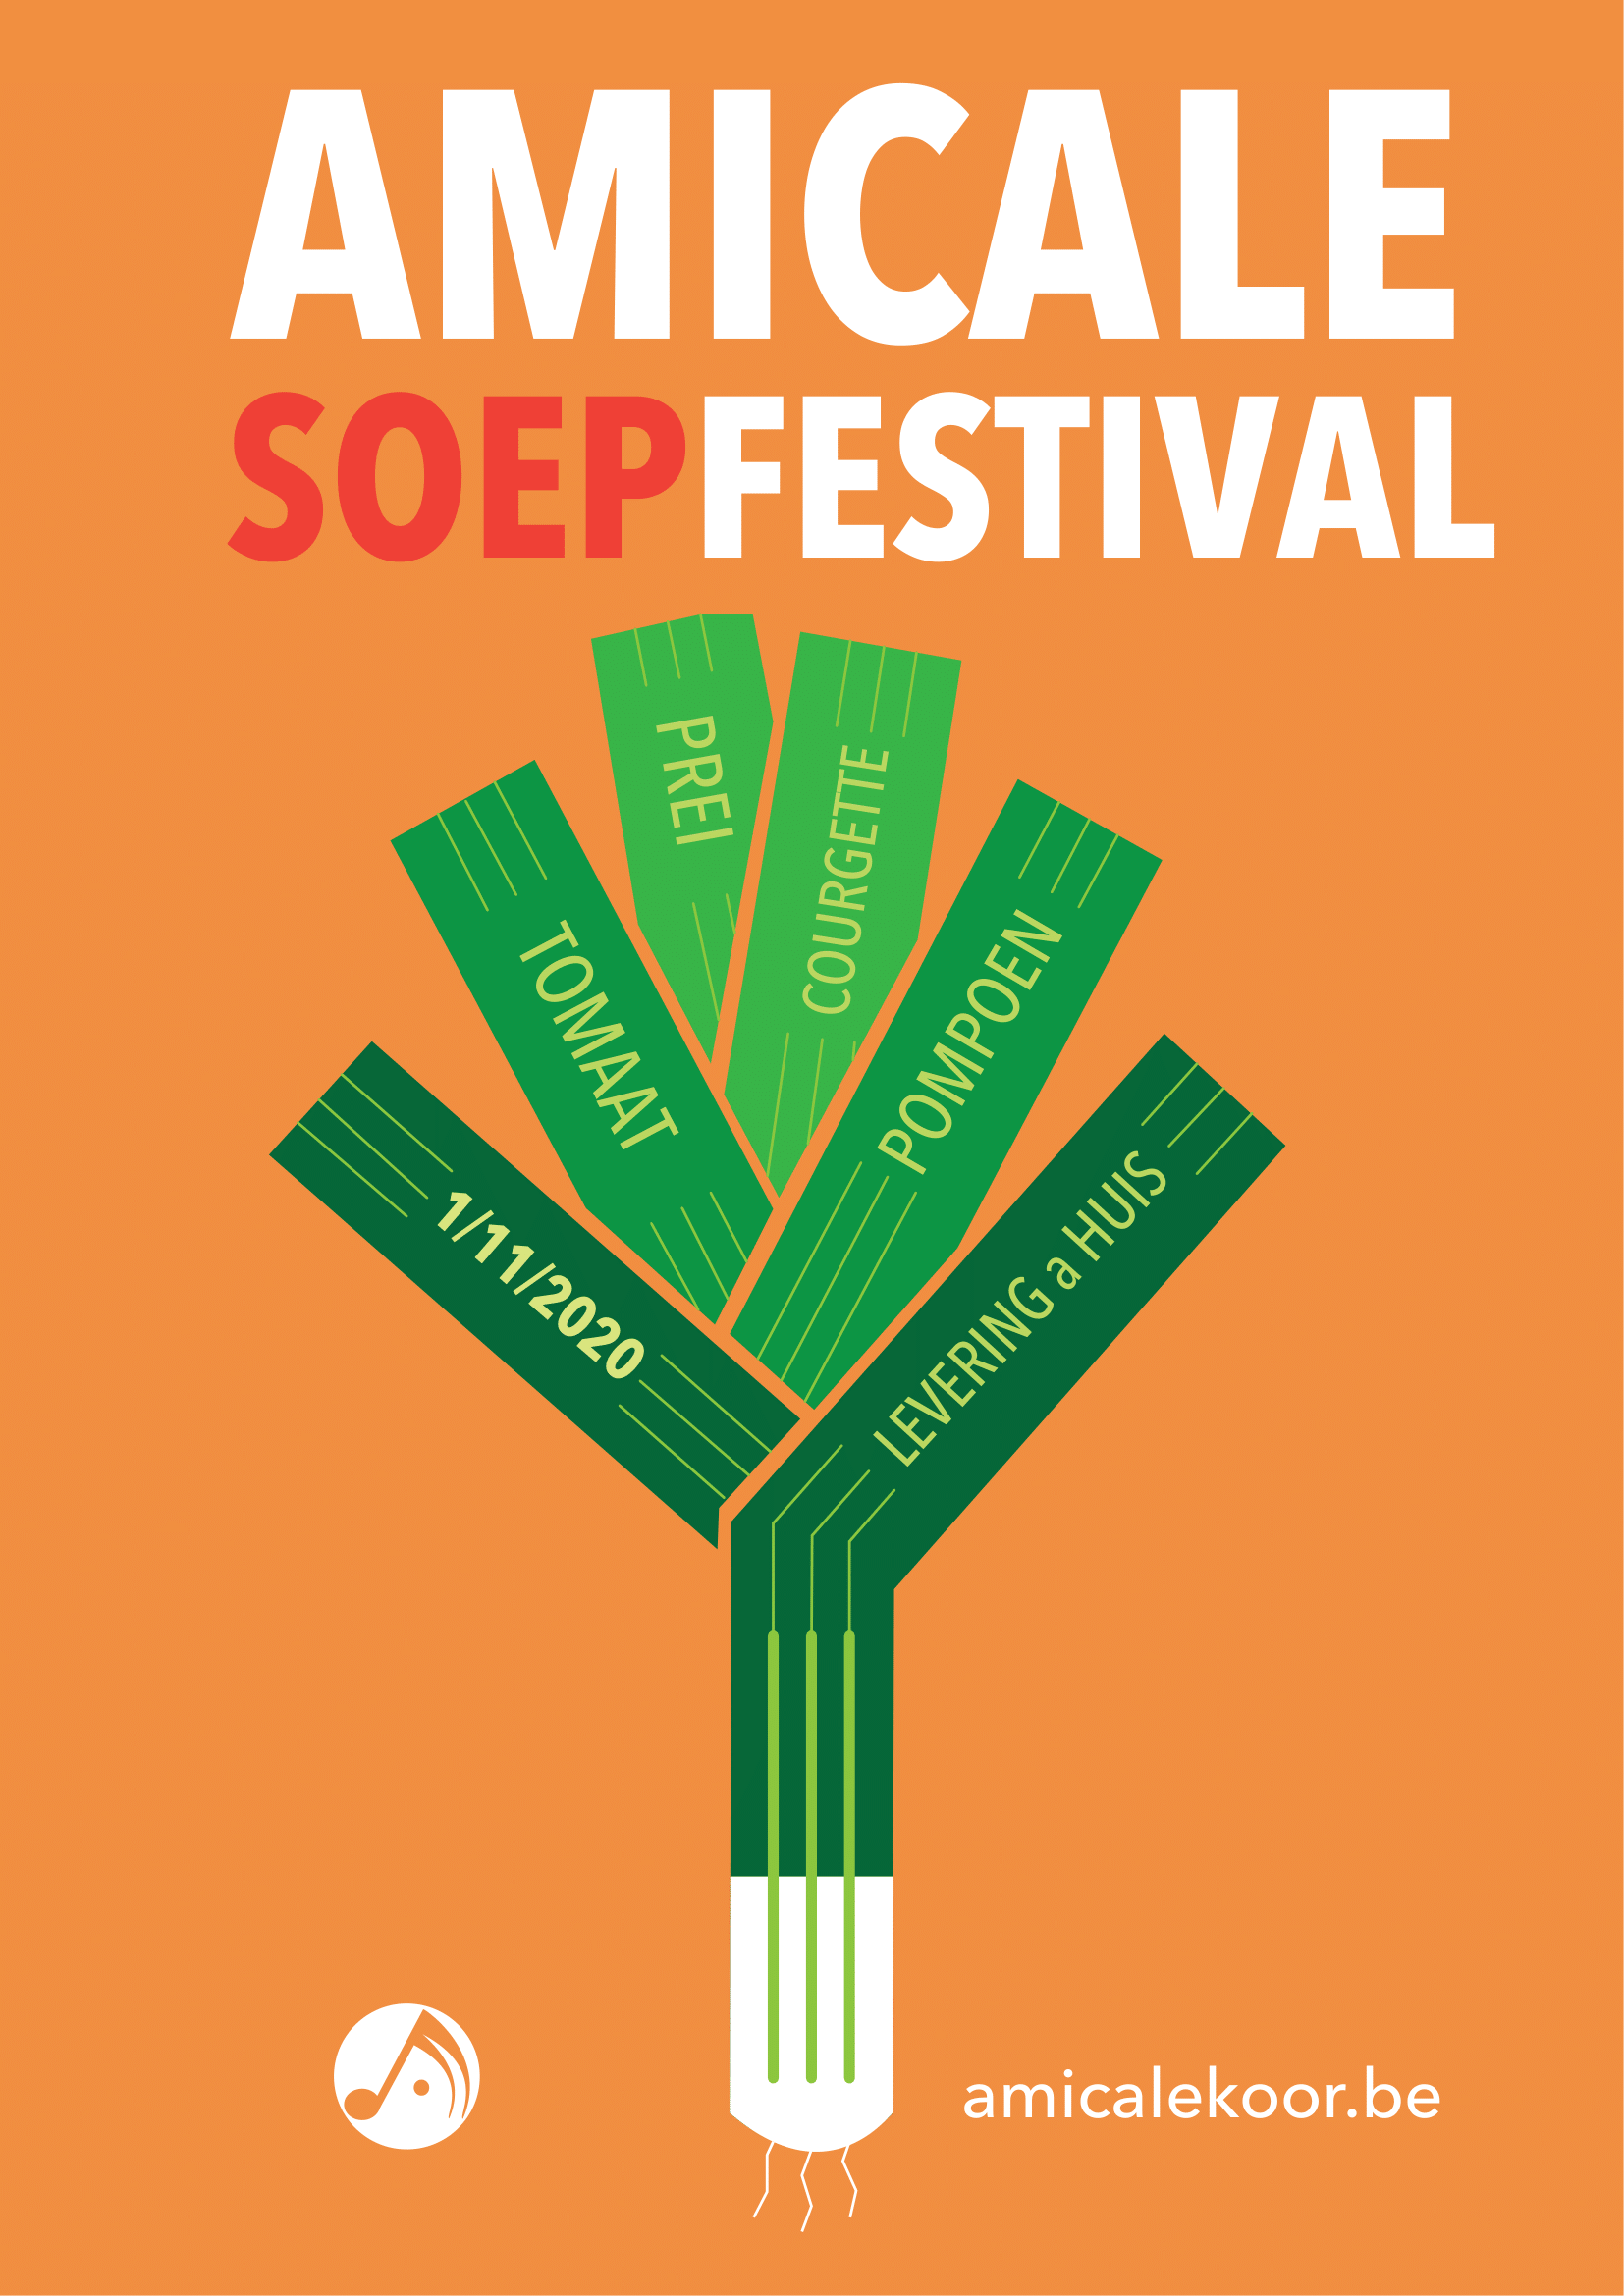 Amicale Soepfestival